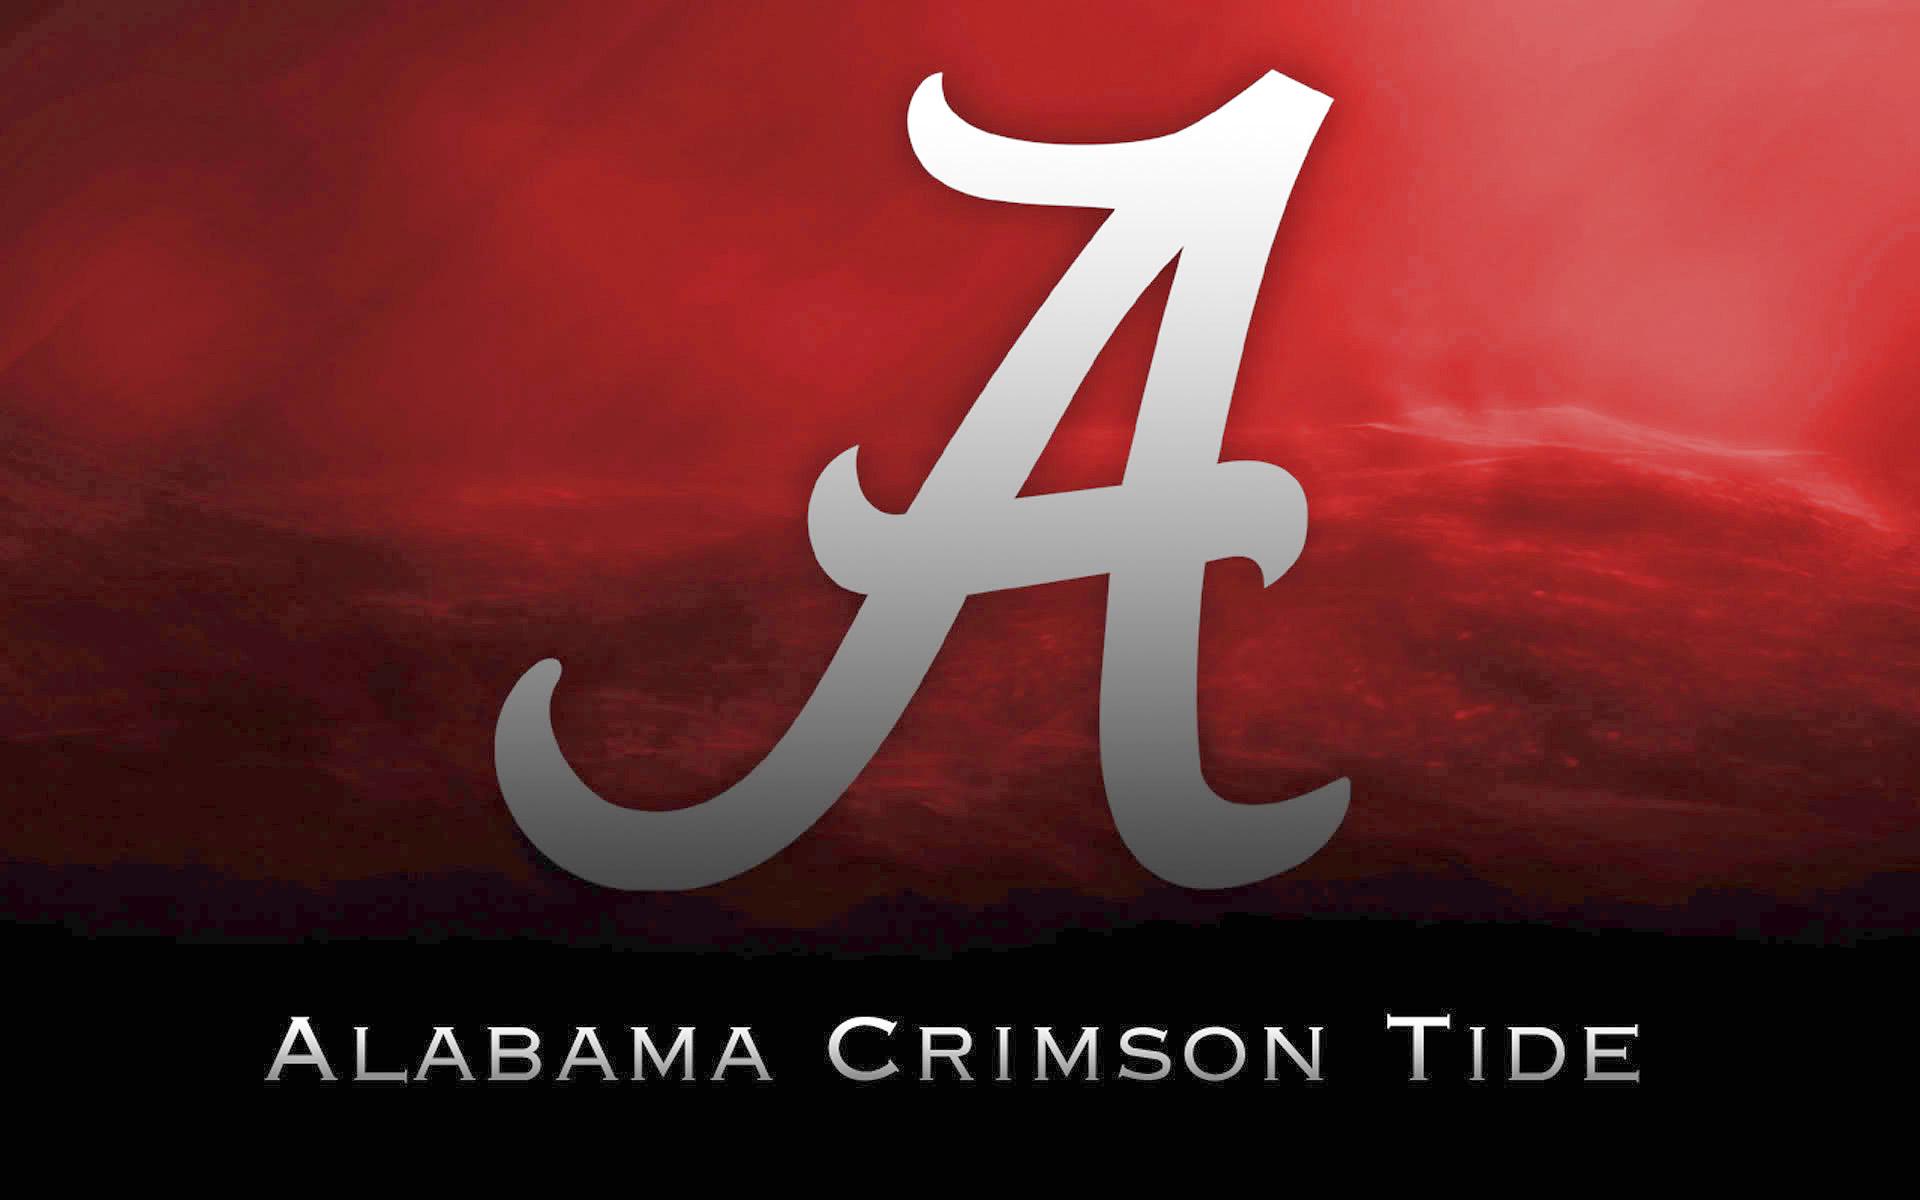 Alabama Crimson Tide Wallpapers 1920x1200